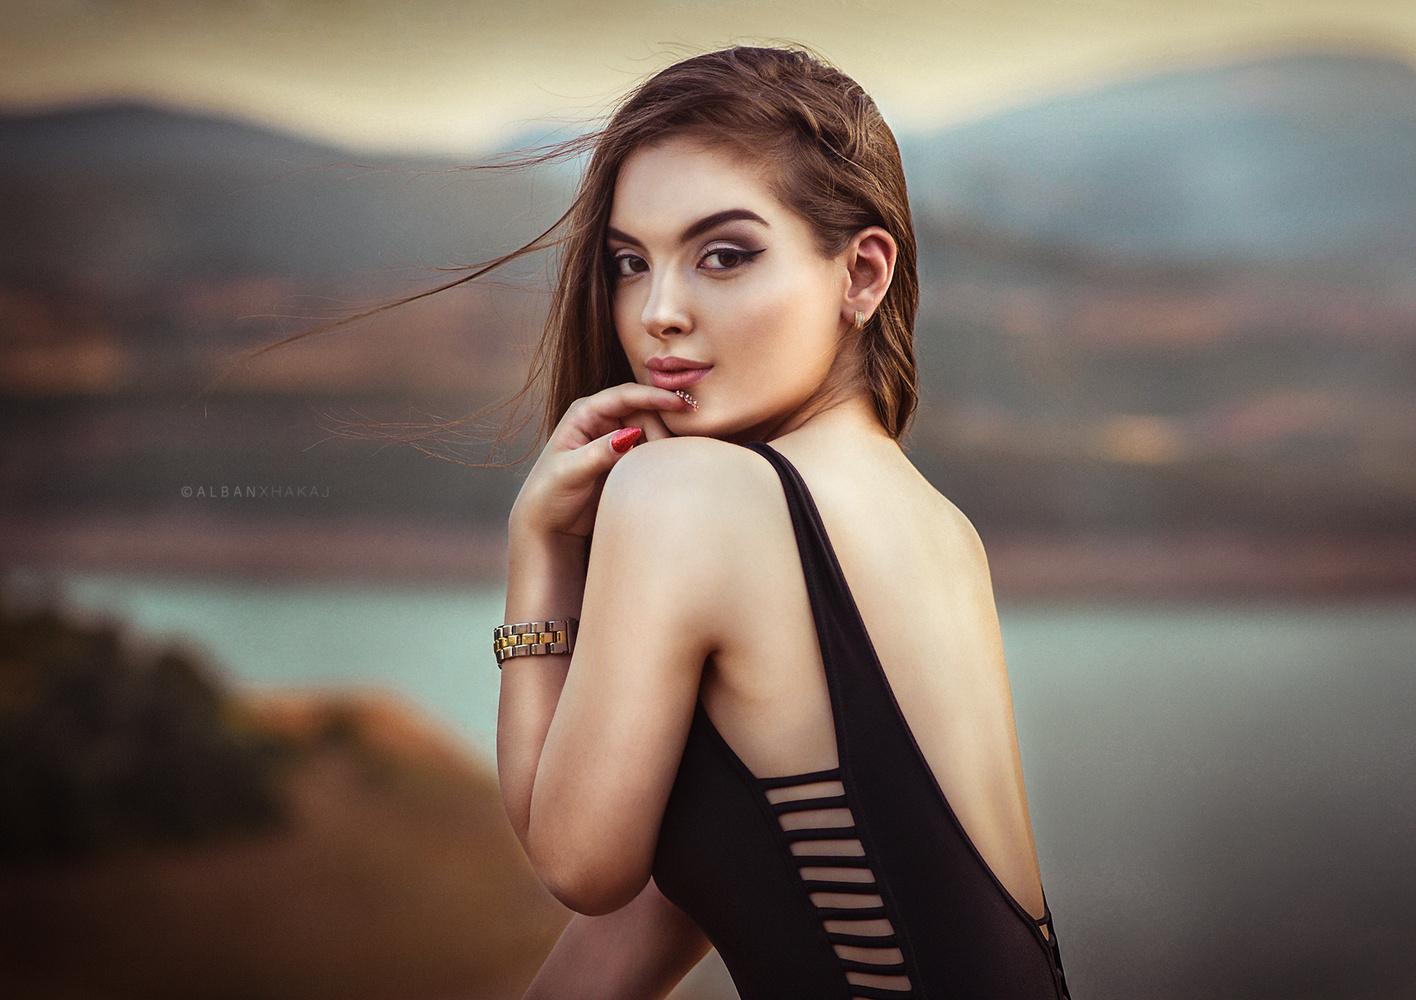 Sara by Alban Xhakaj